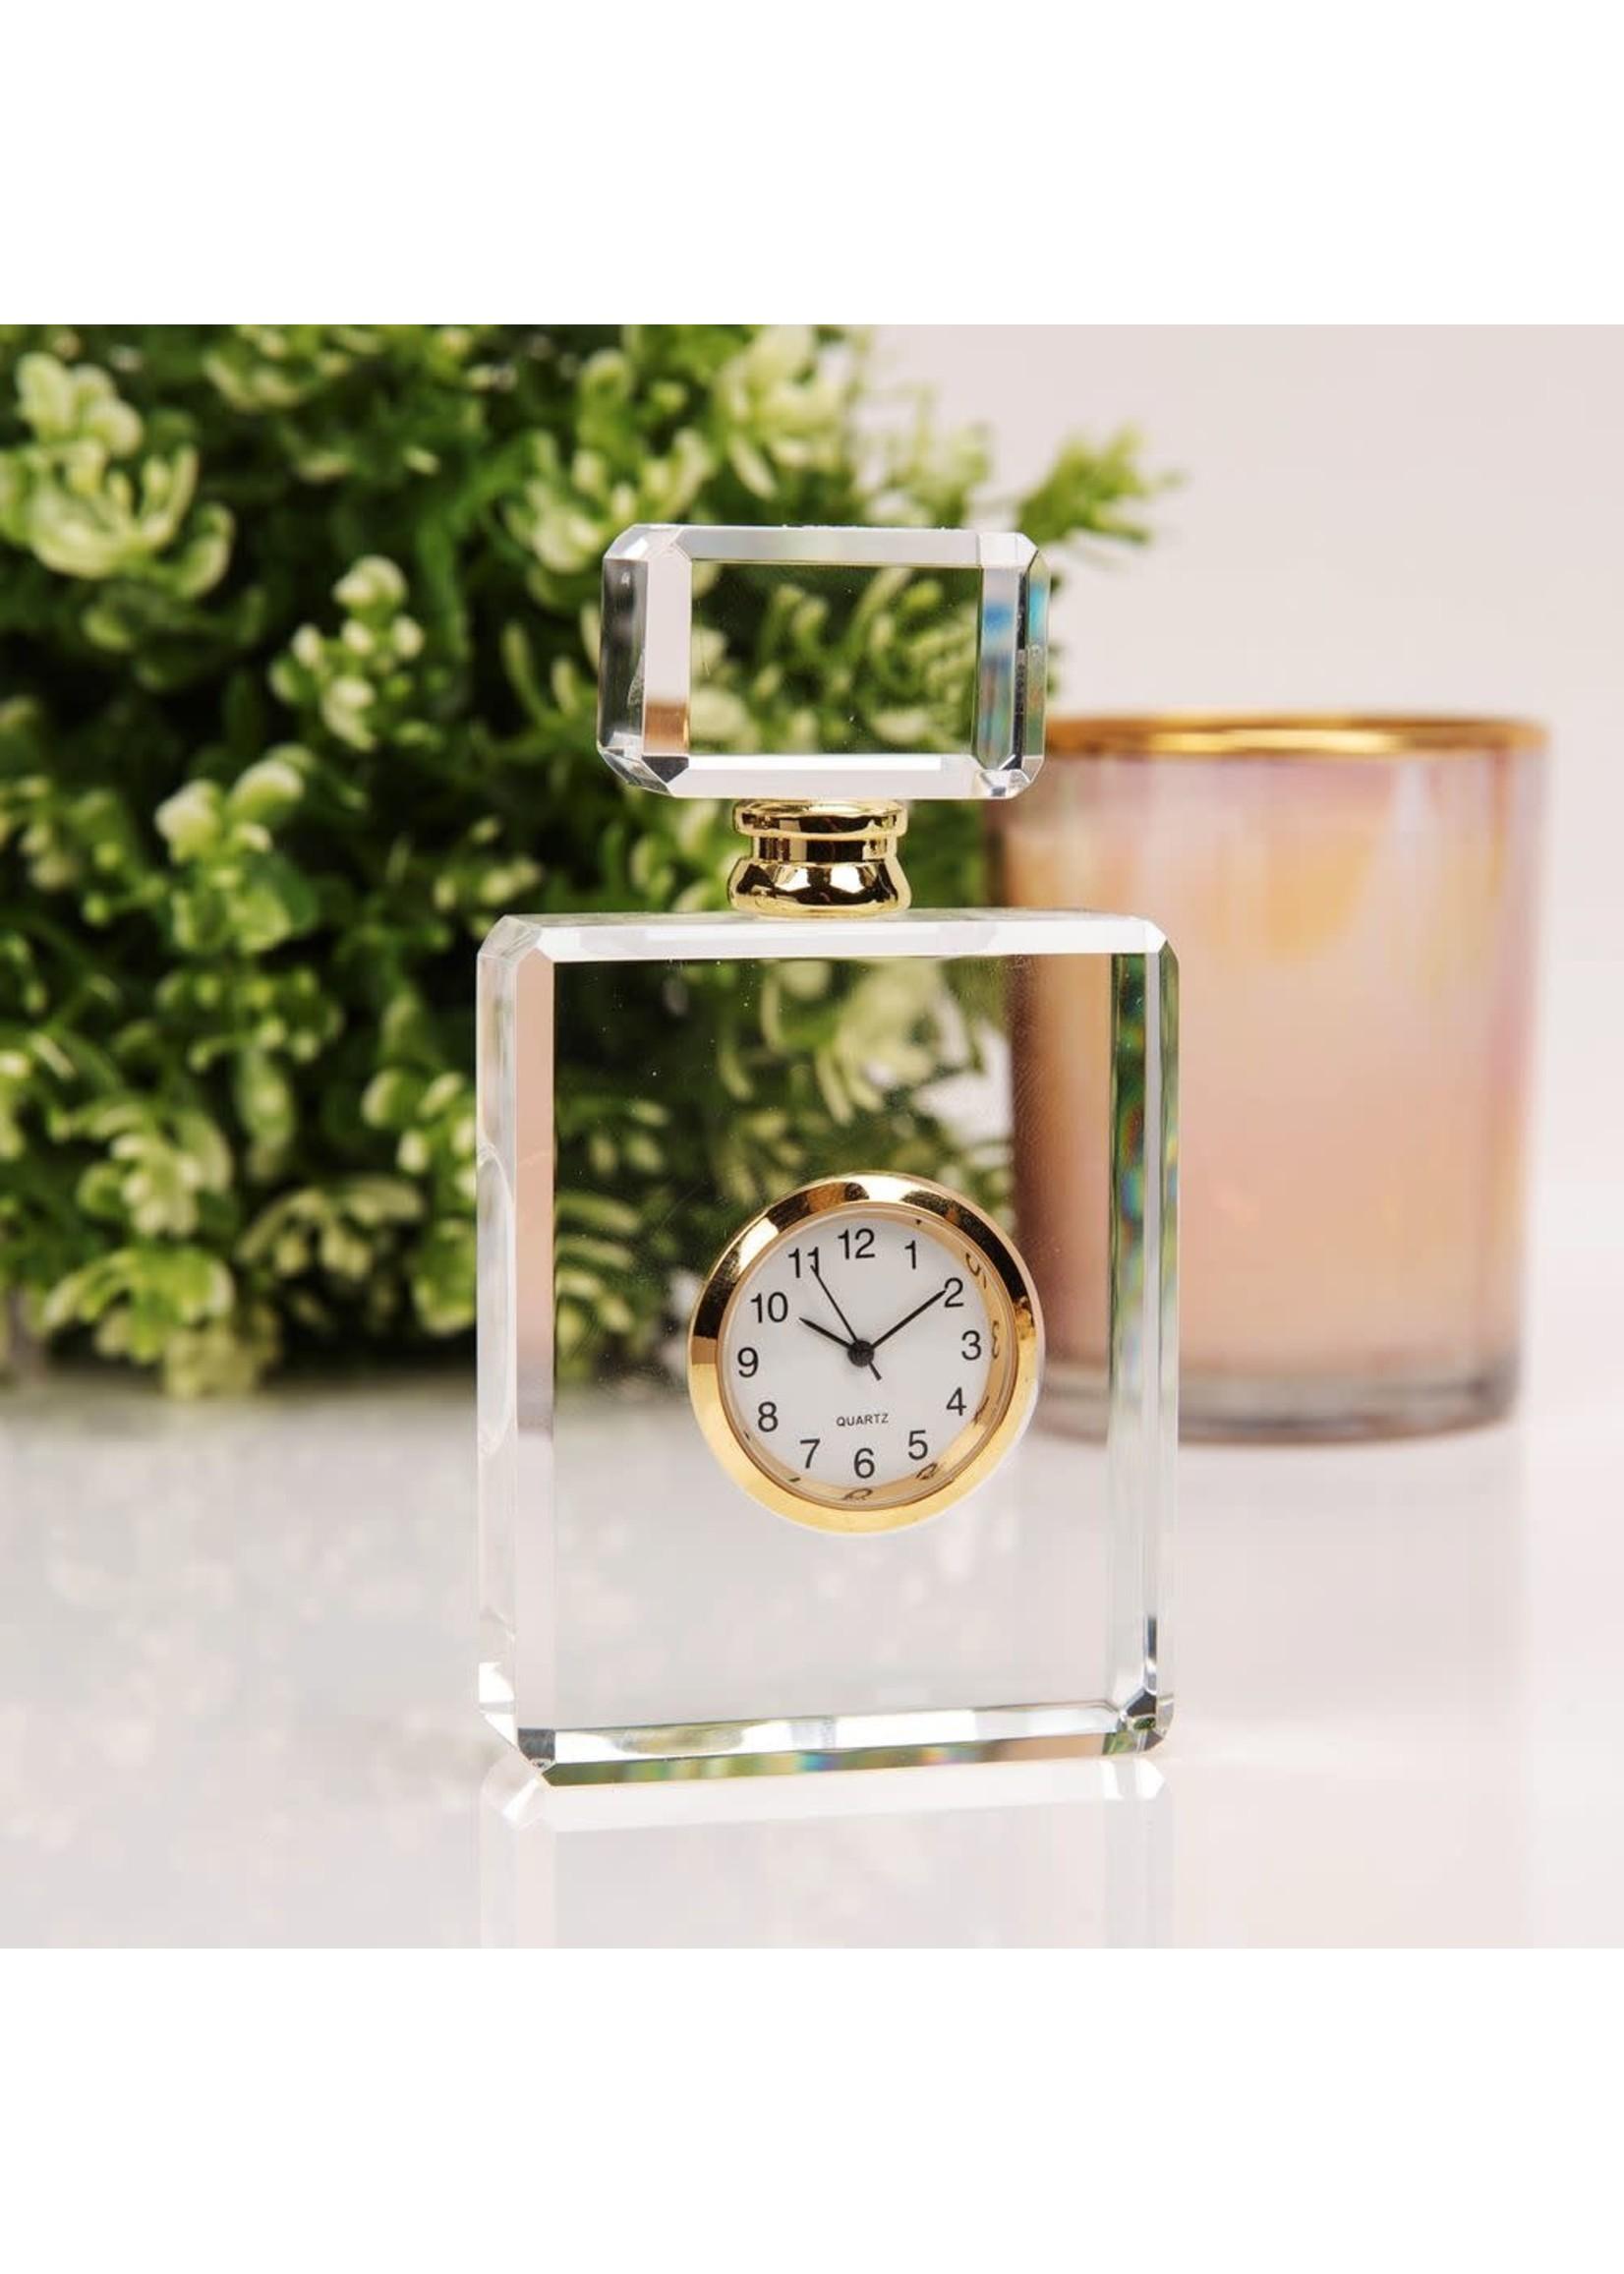 MINIATURE GLASS CLOCK - PERFUME BOTTLE